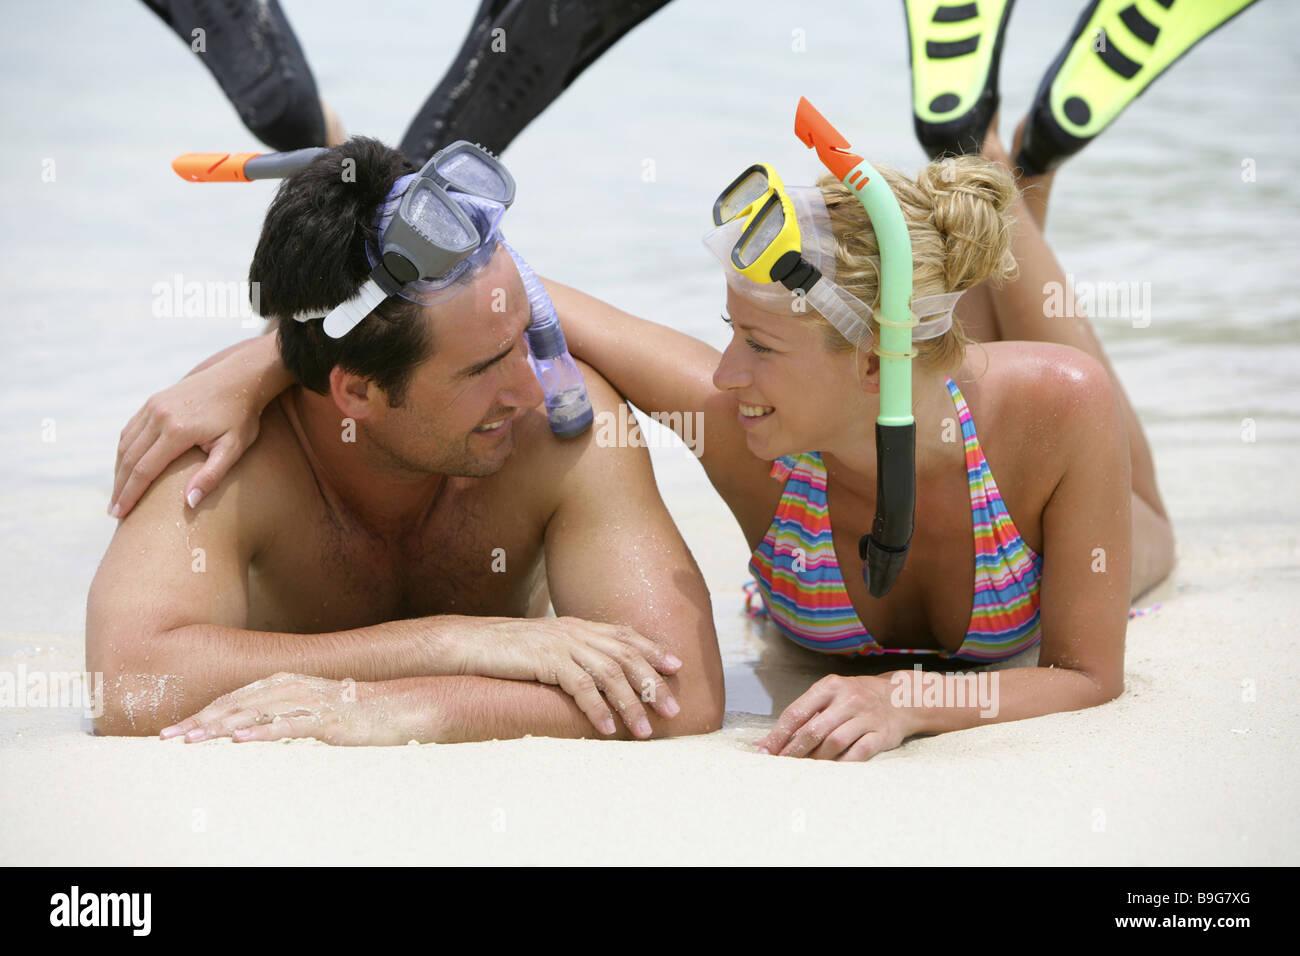 Liveliness bath-clothing bathing beach-holidays touch relationship gaze camera relaxation relaxation flirt fins - Stock Image